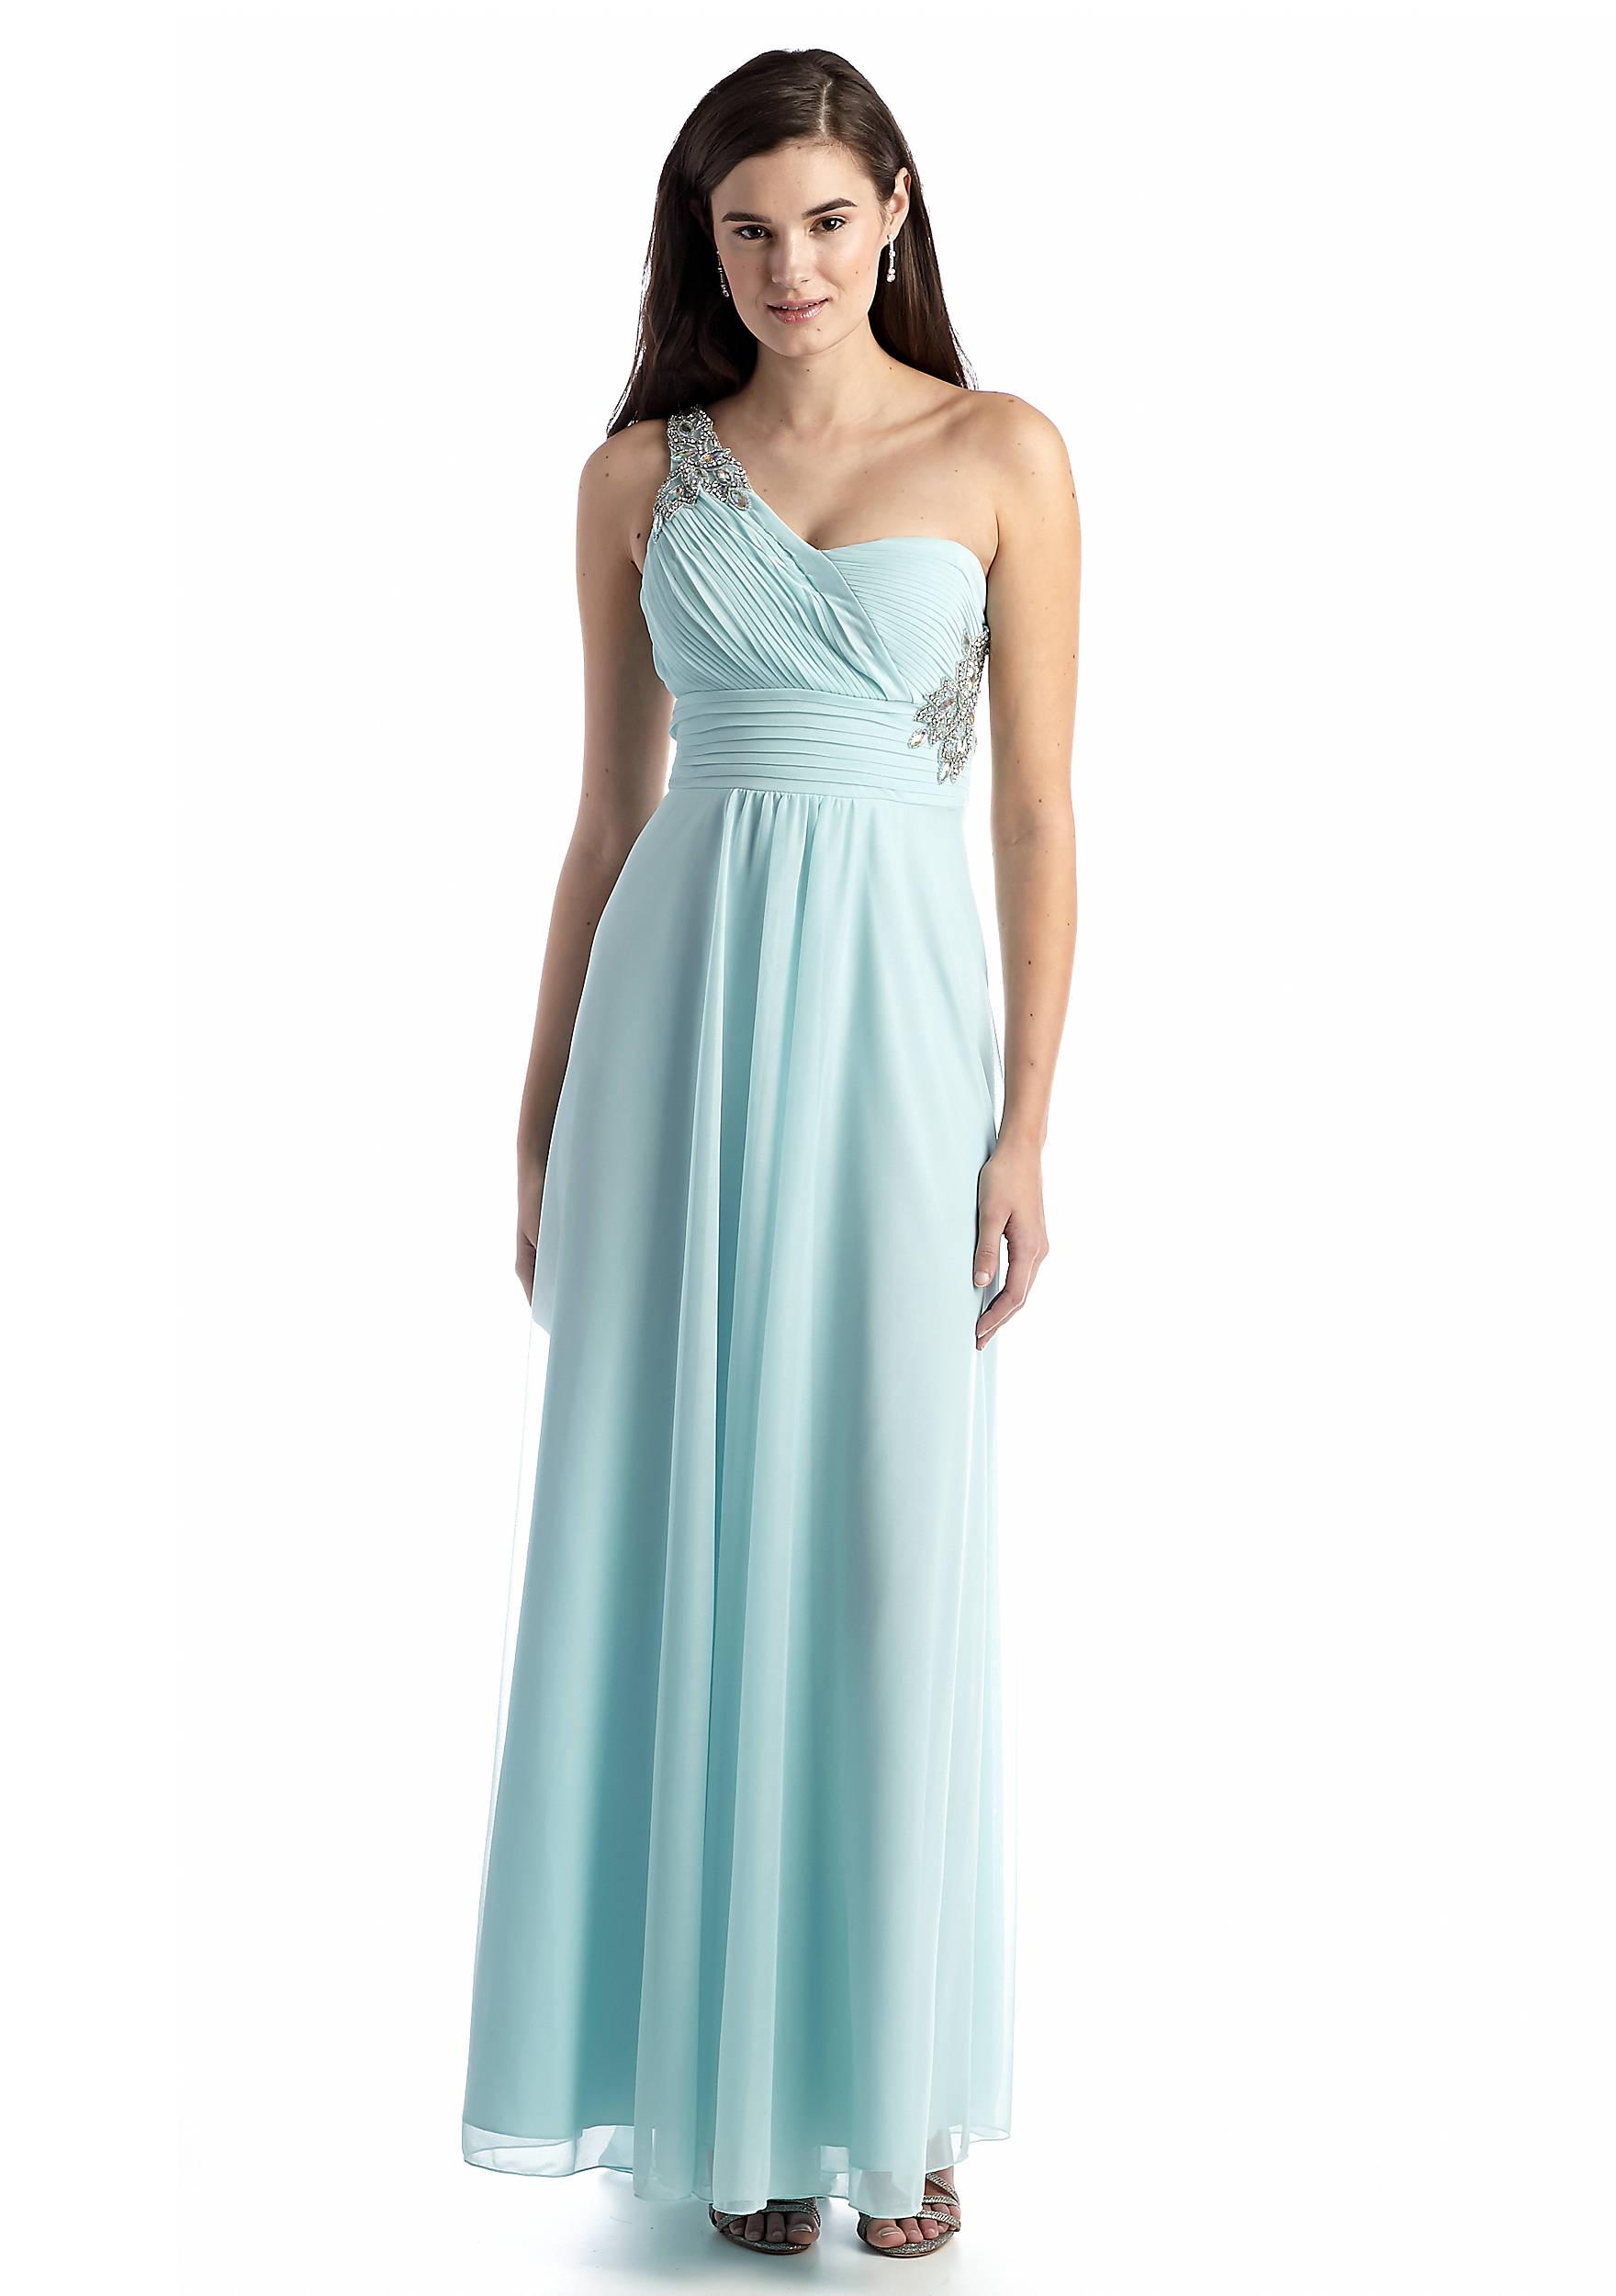 Colorful Belk Bridesmaid Dresses Pattern - All Wedding Dresses ...